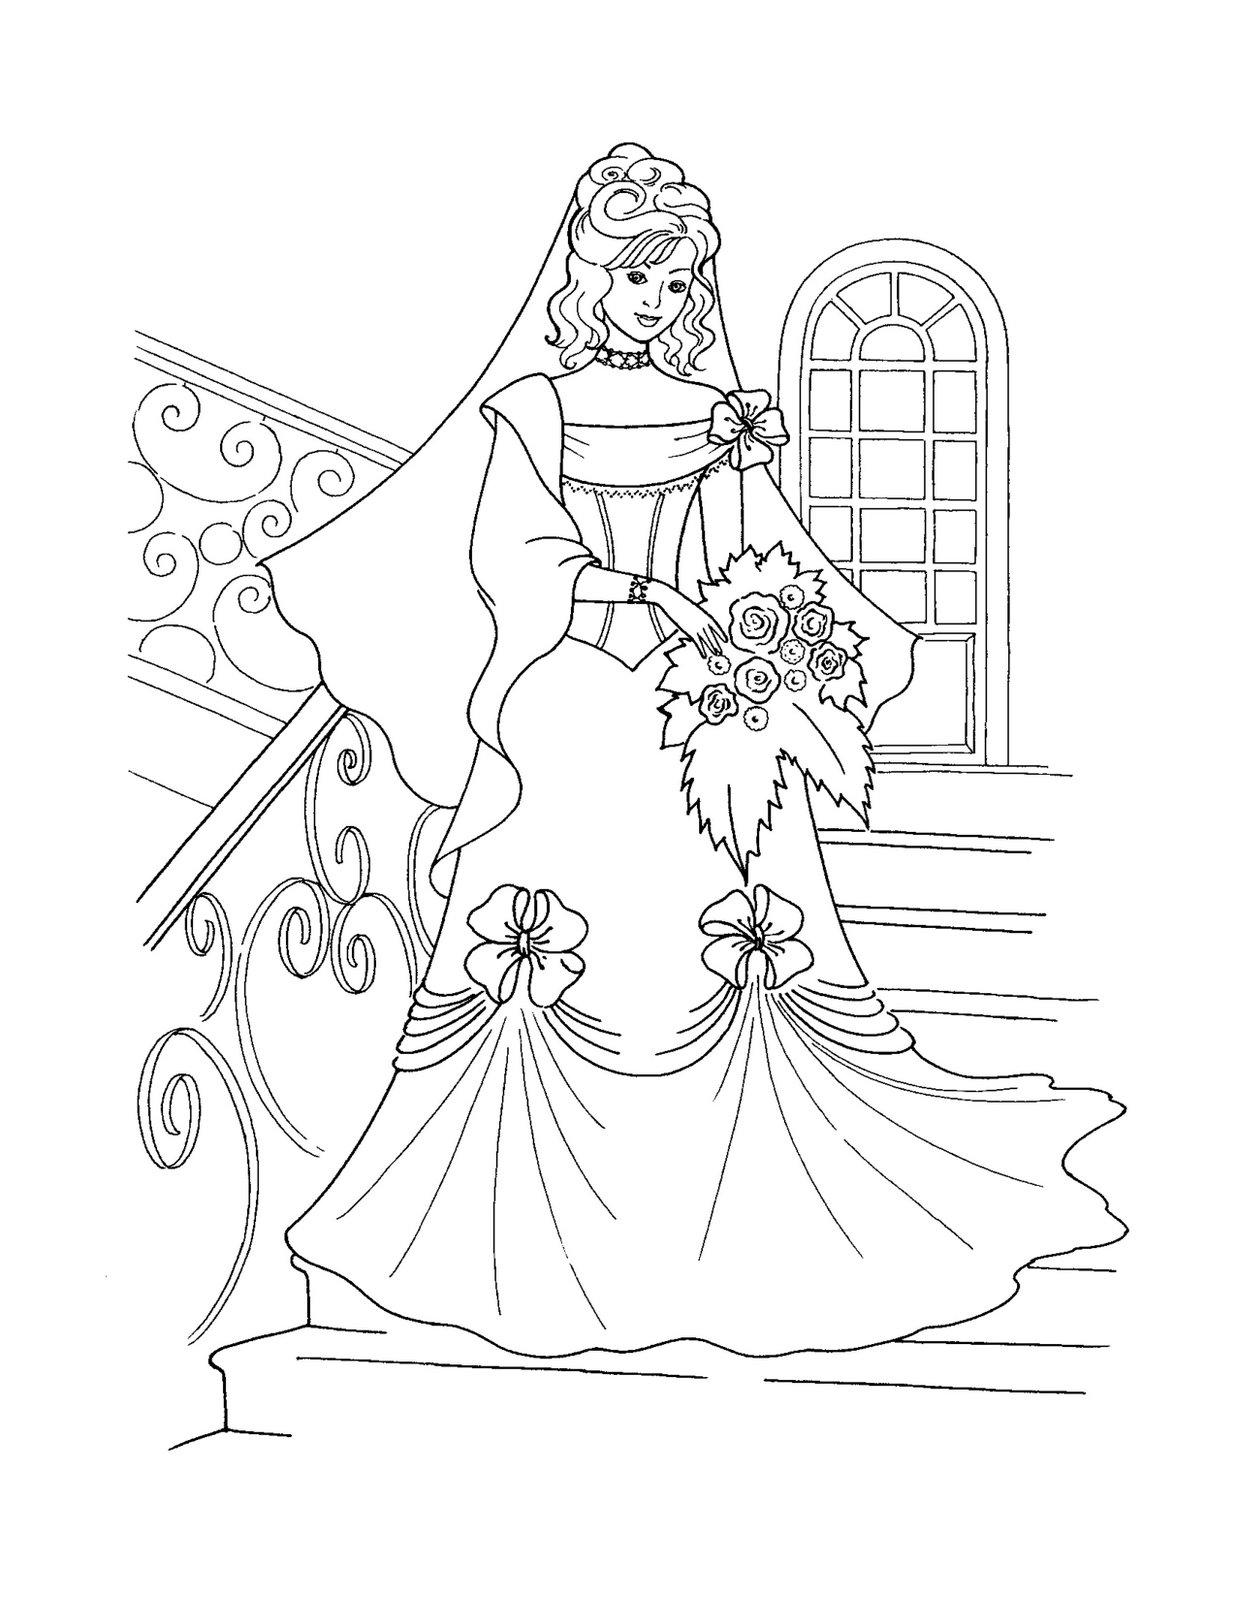 1236x1600 Princess Coloring Pages